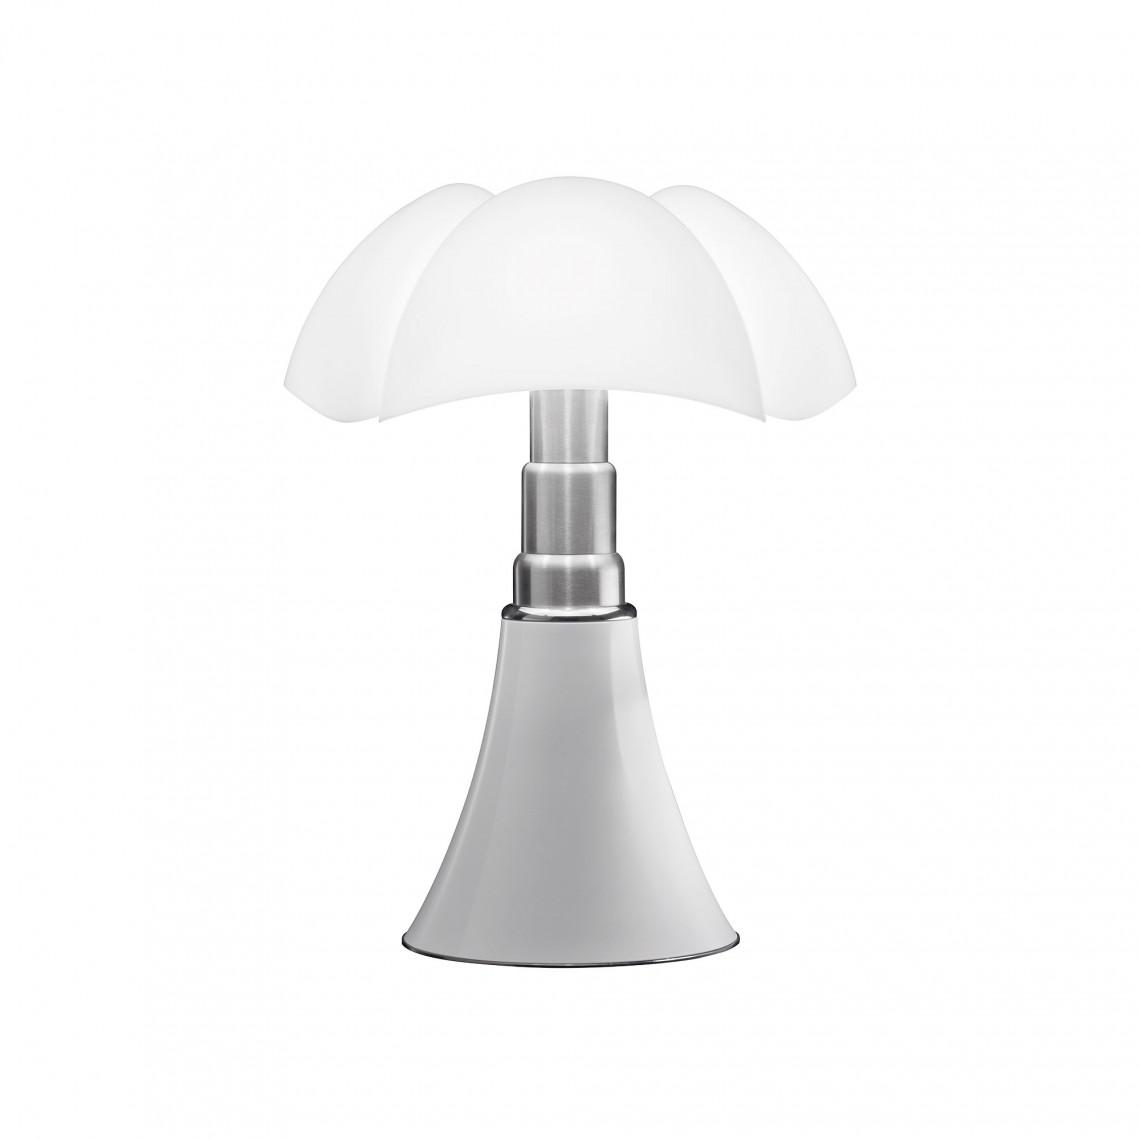 Pipistrello Medium Table Lamp - Dimbar White